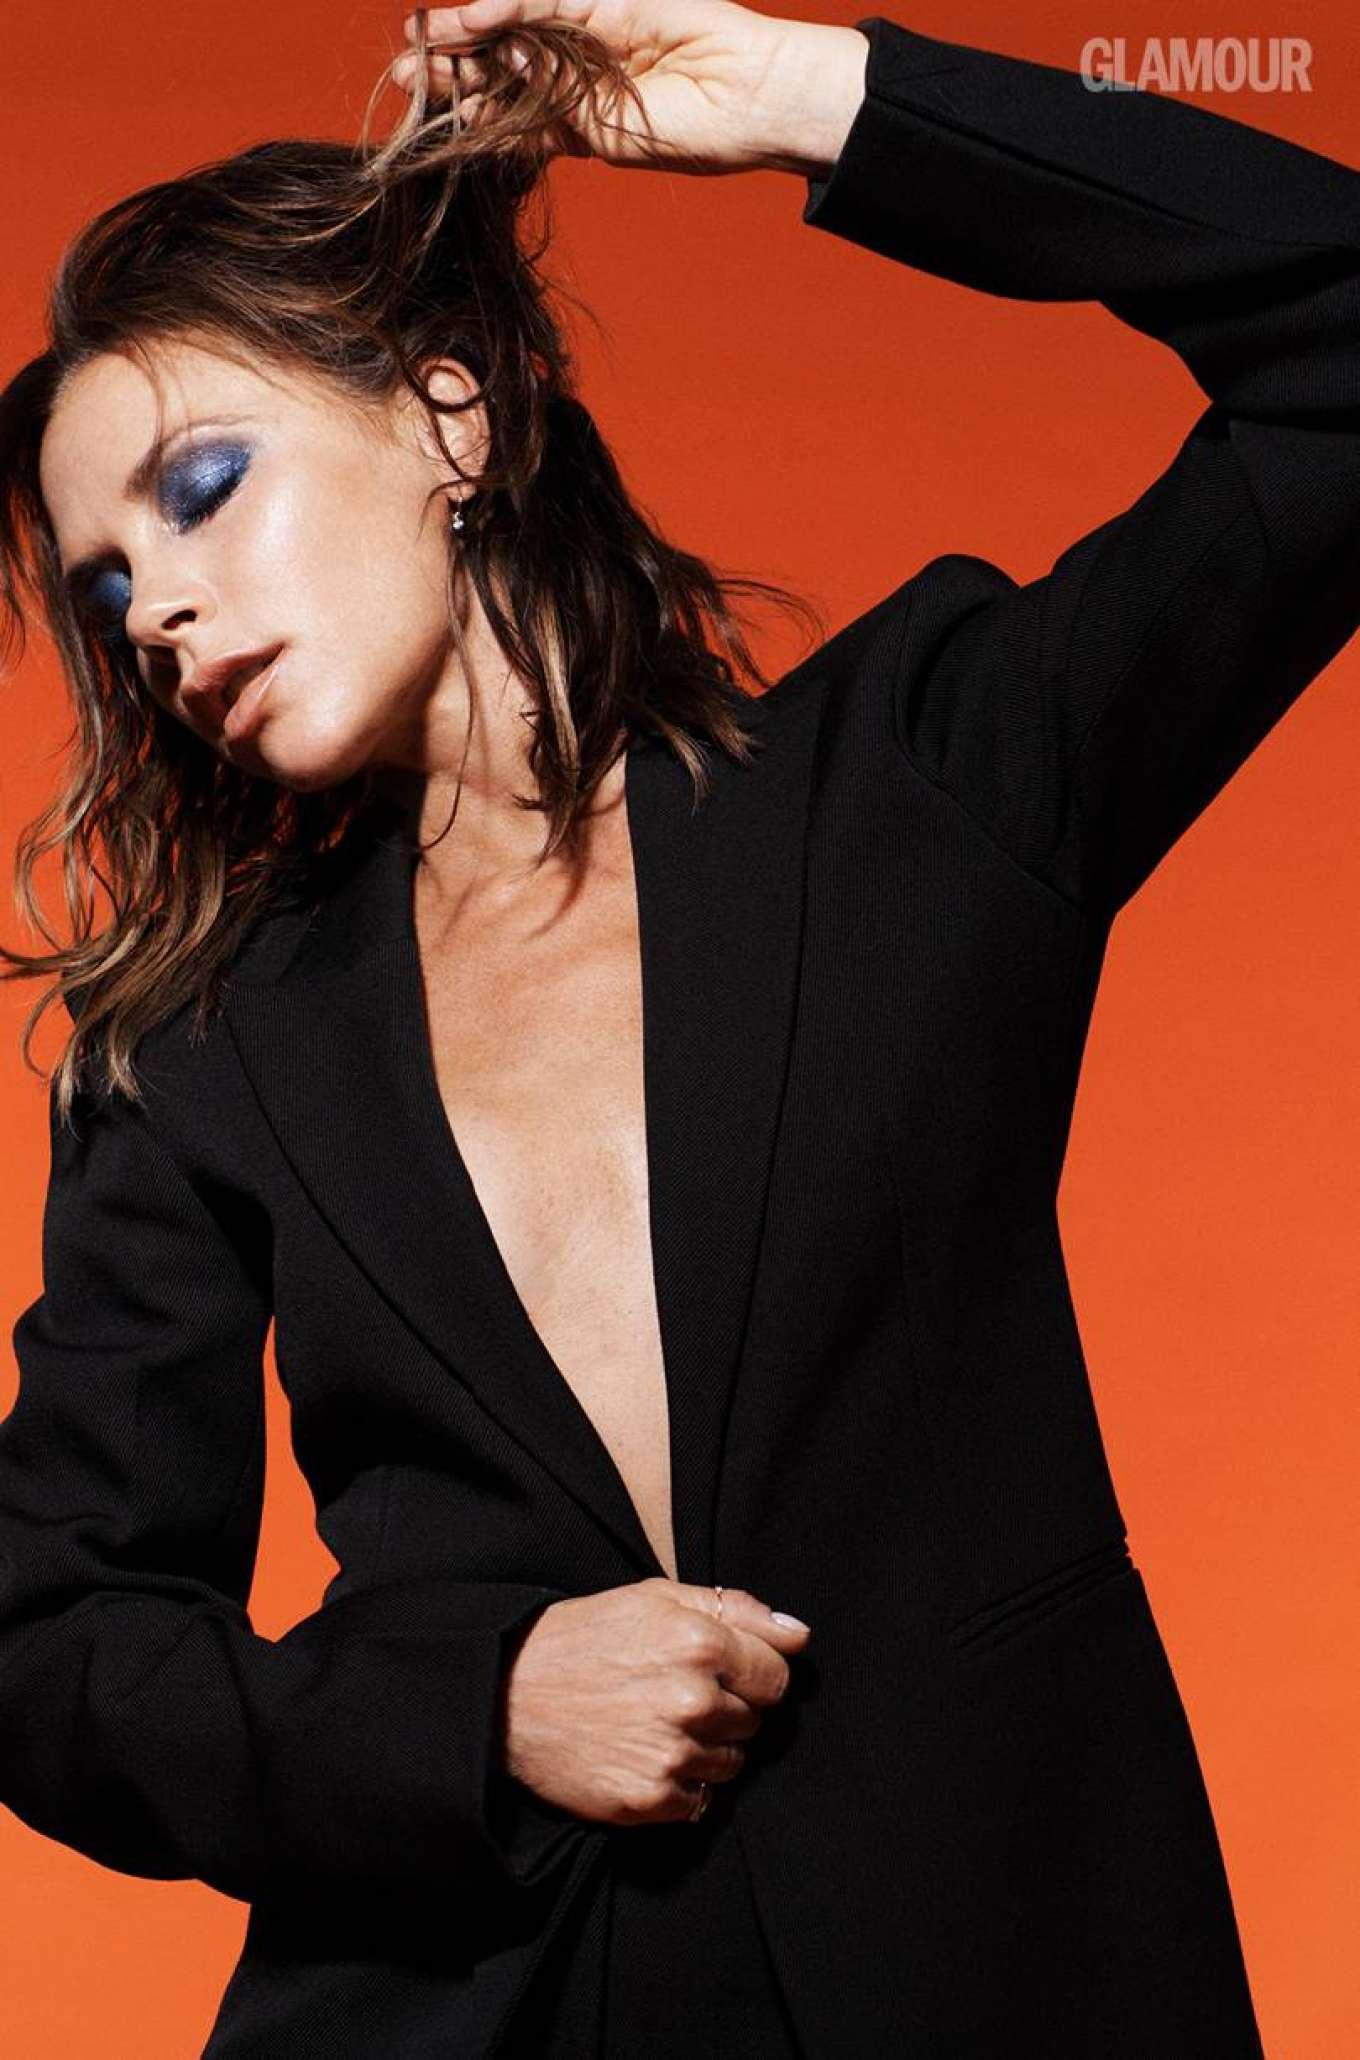 Victoria Beckham - Glamour UK Magazine (Autumn/Winter 2019)